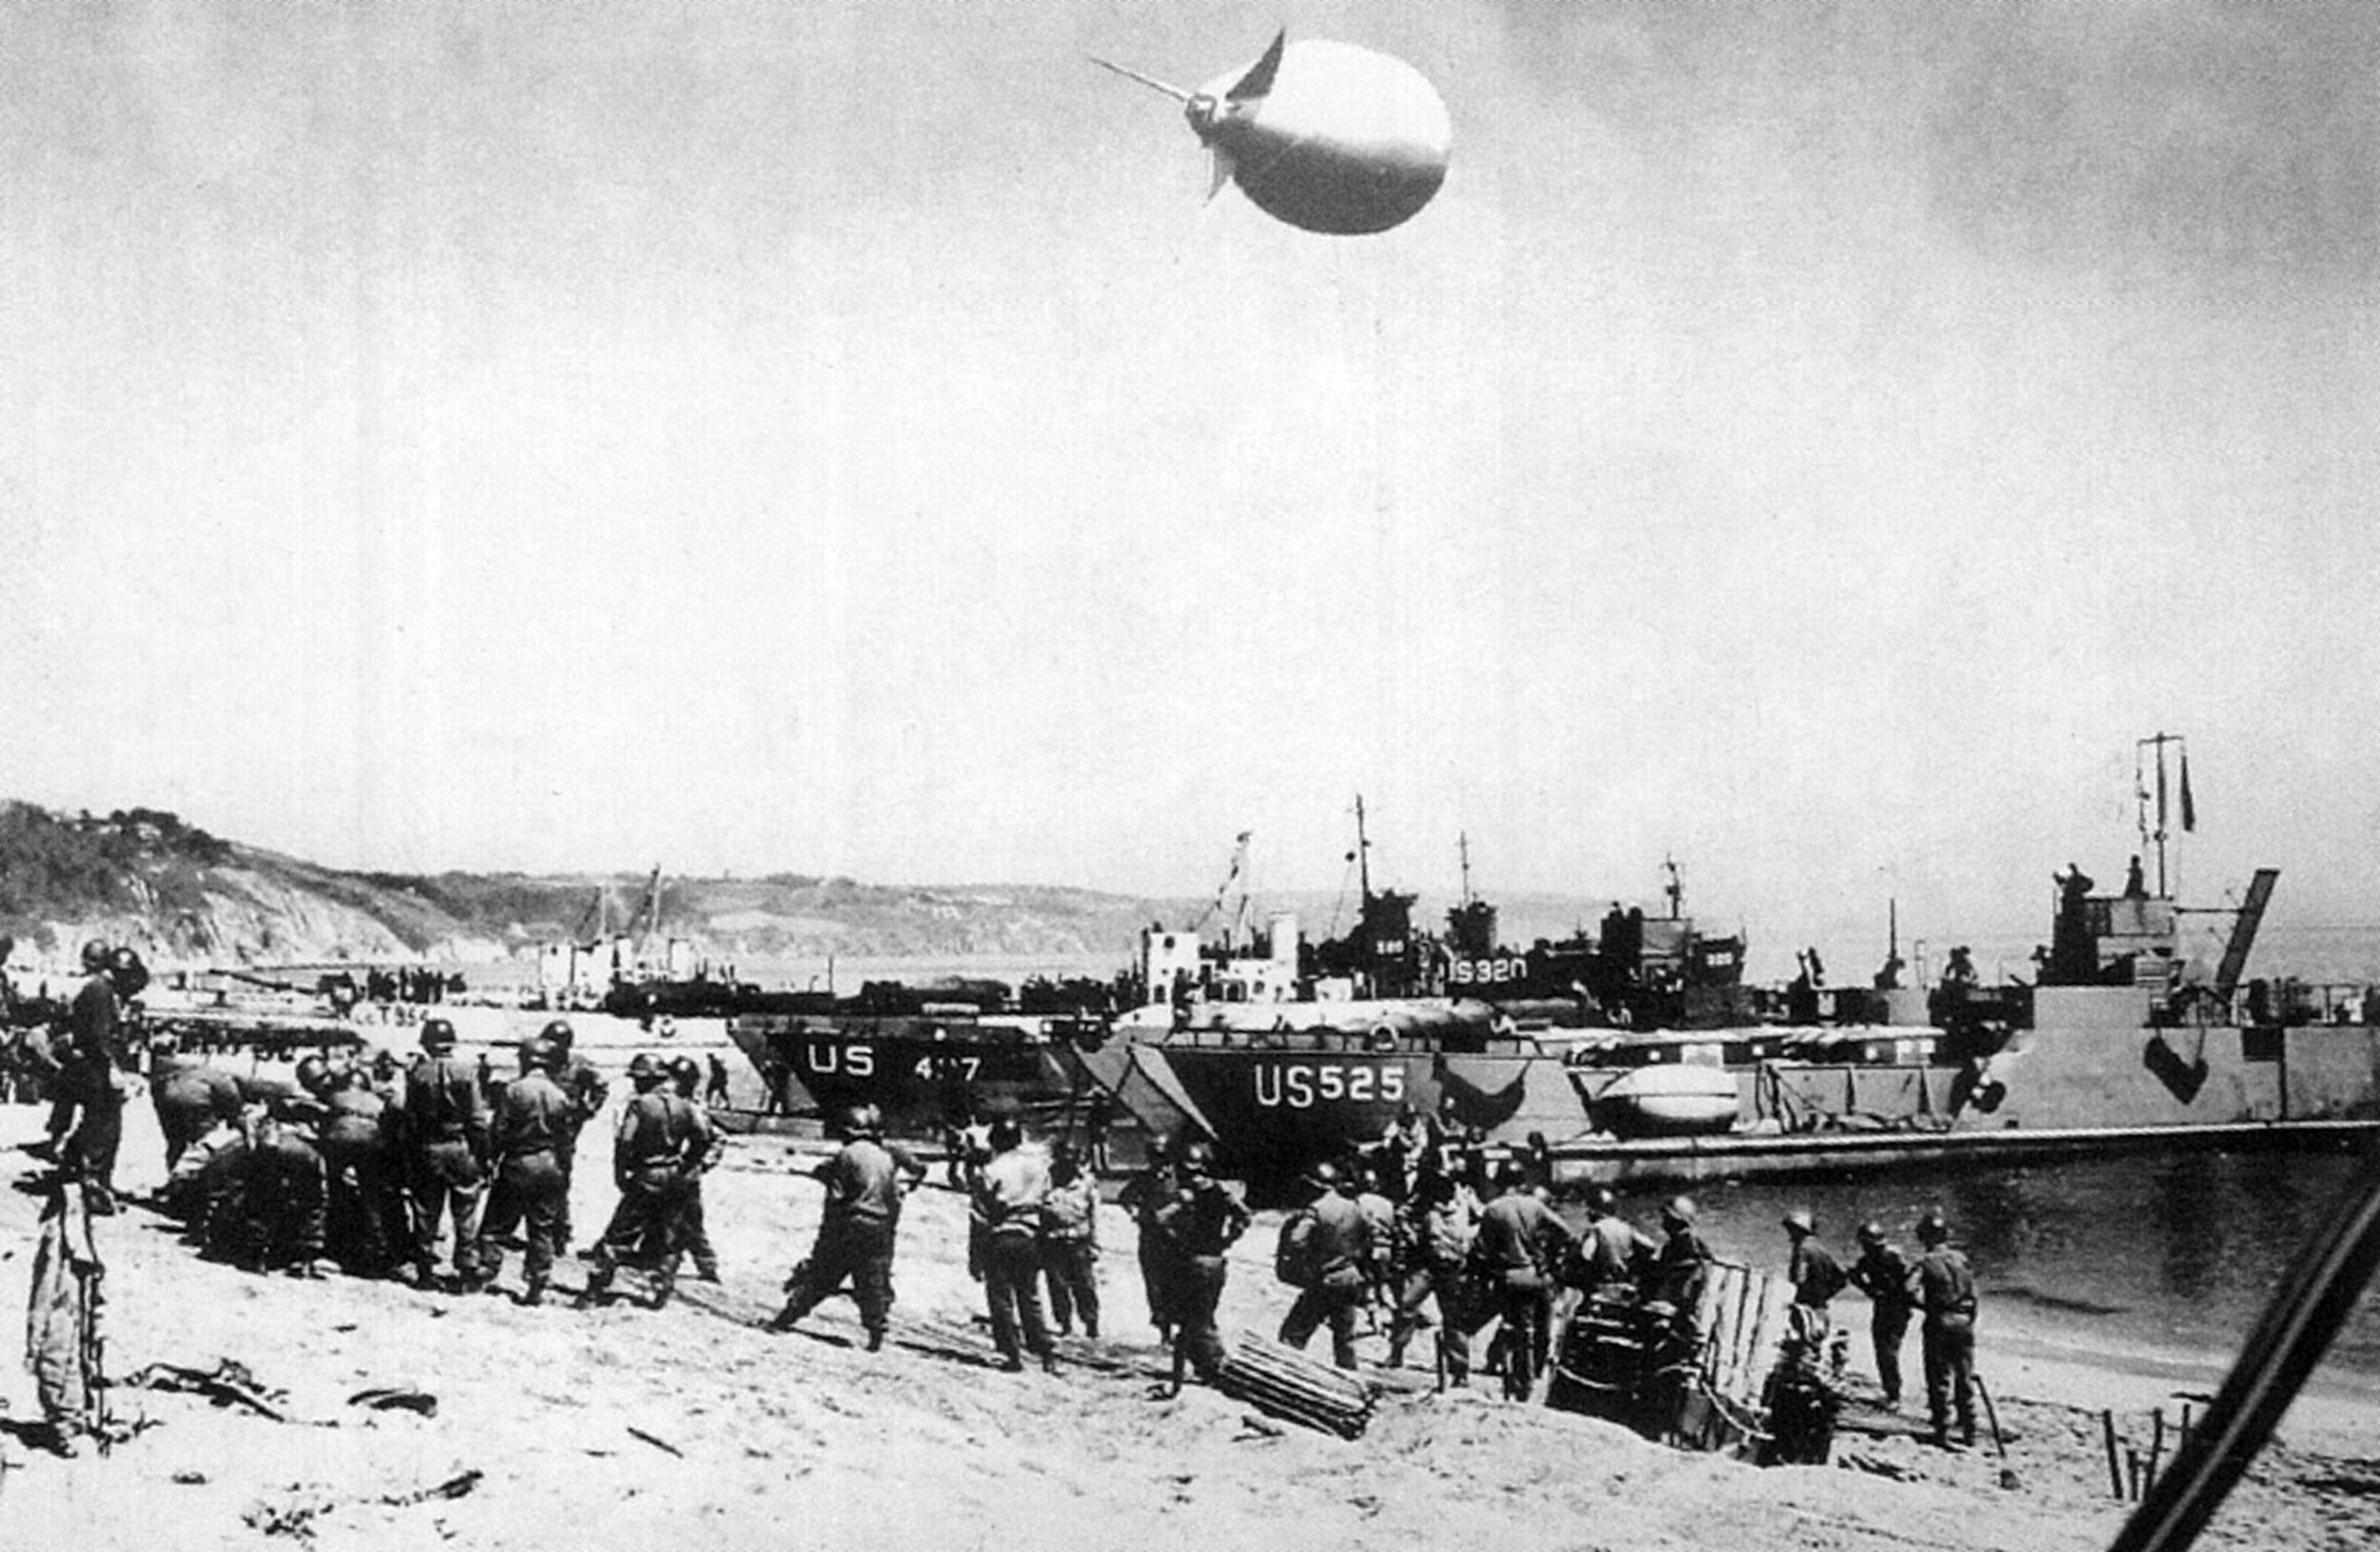 Exercise-Tiger-landings-at-Slapton-Sands_-Courtesy-The-US-National-Archives.jpg